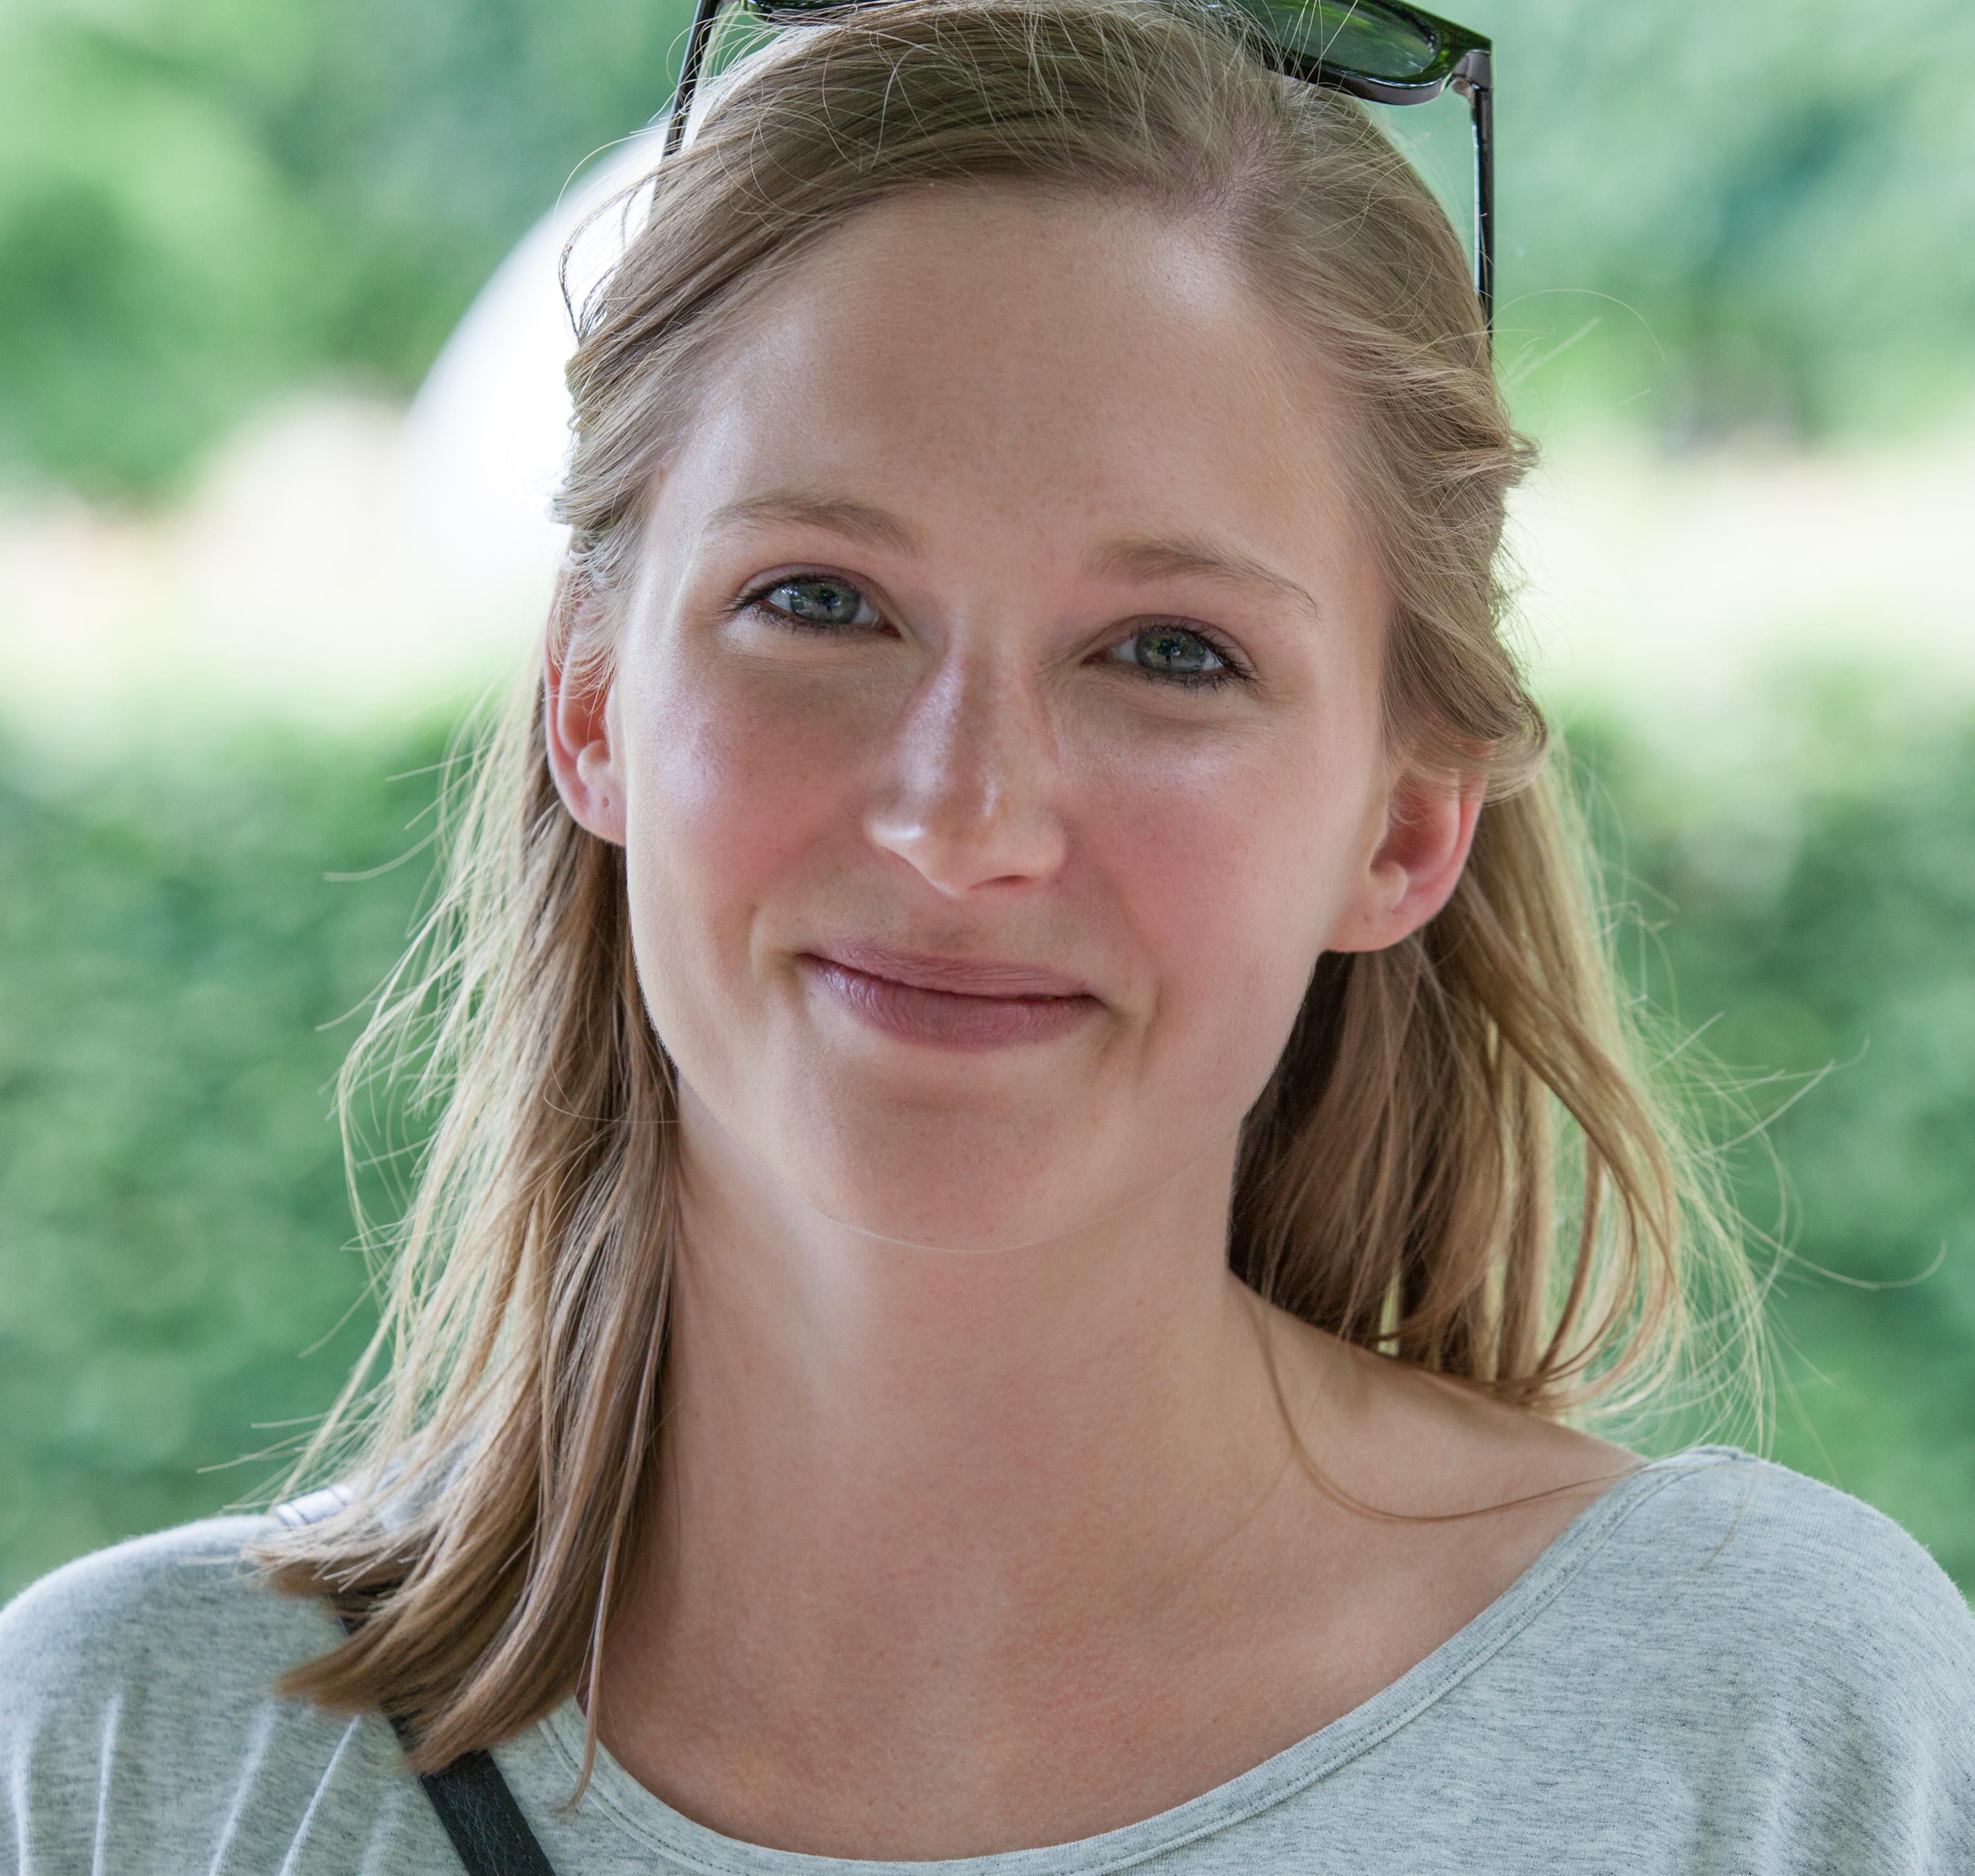 Photo of a cute fair-haired girl in Copenhagen, Denmark